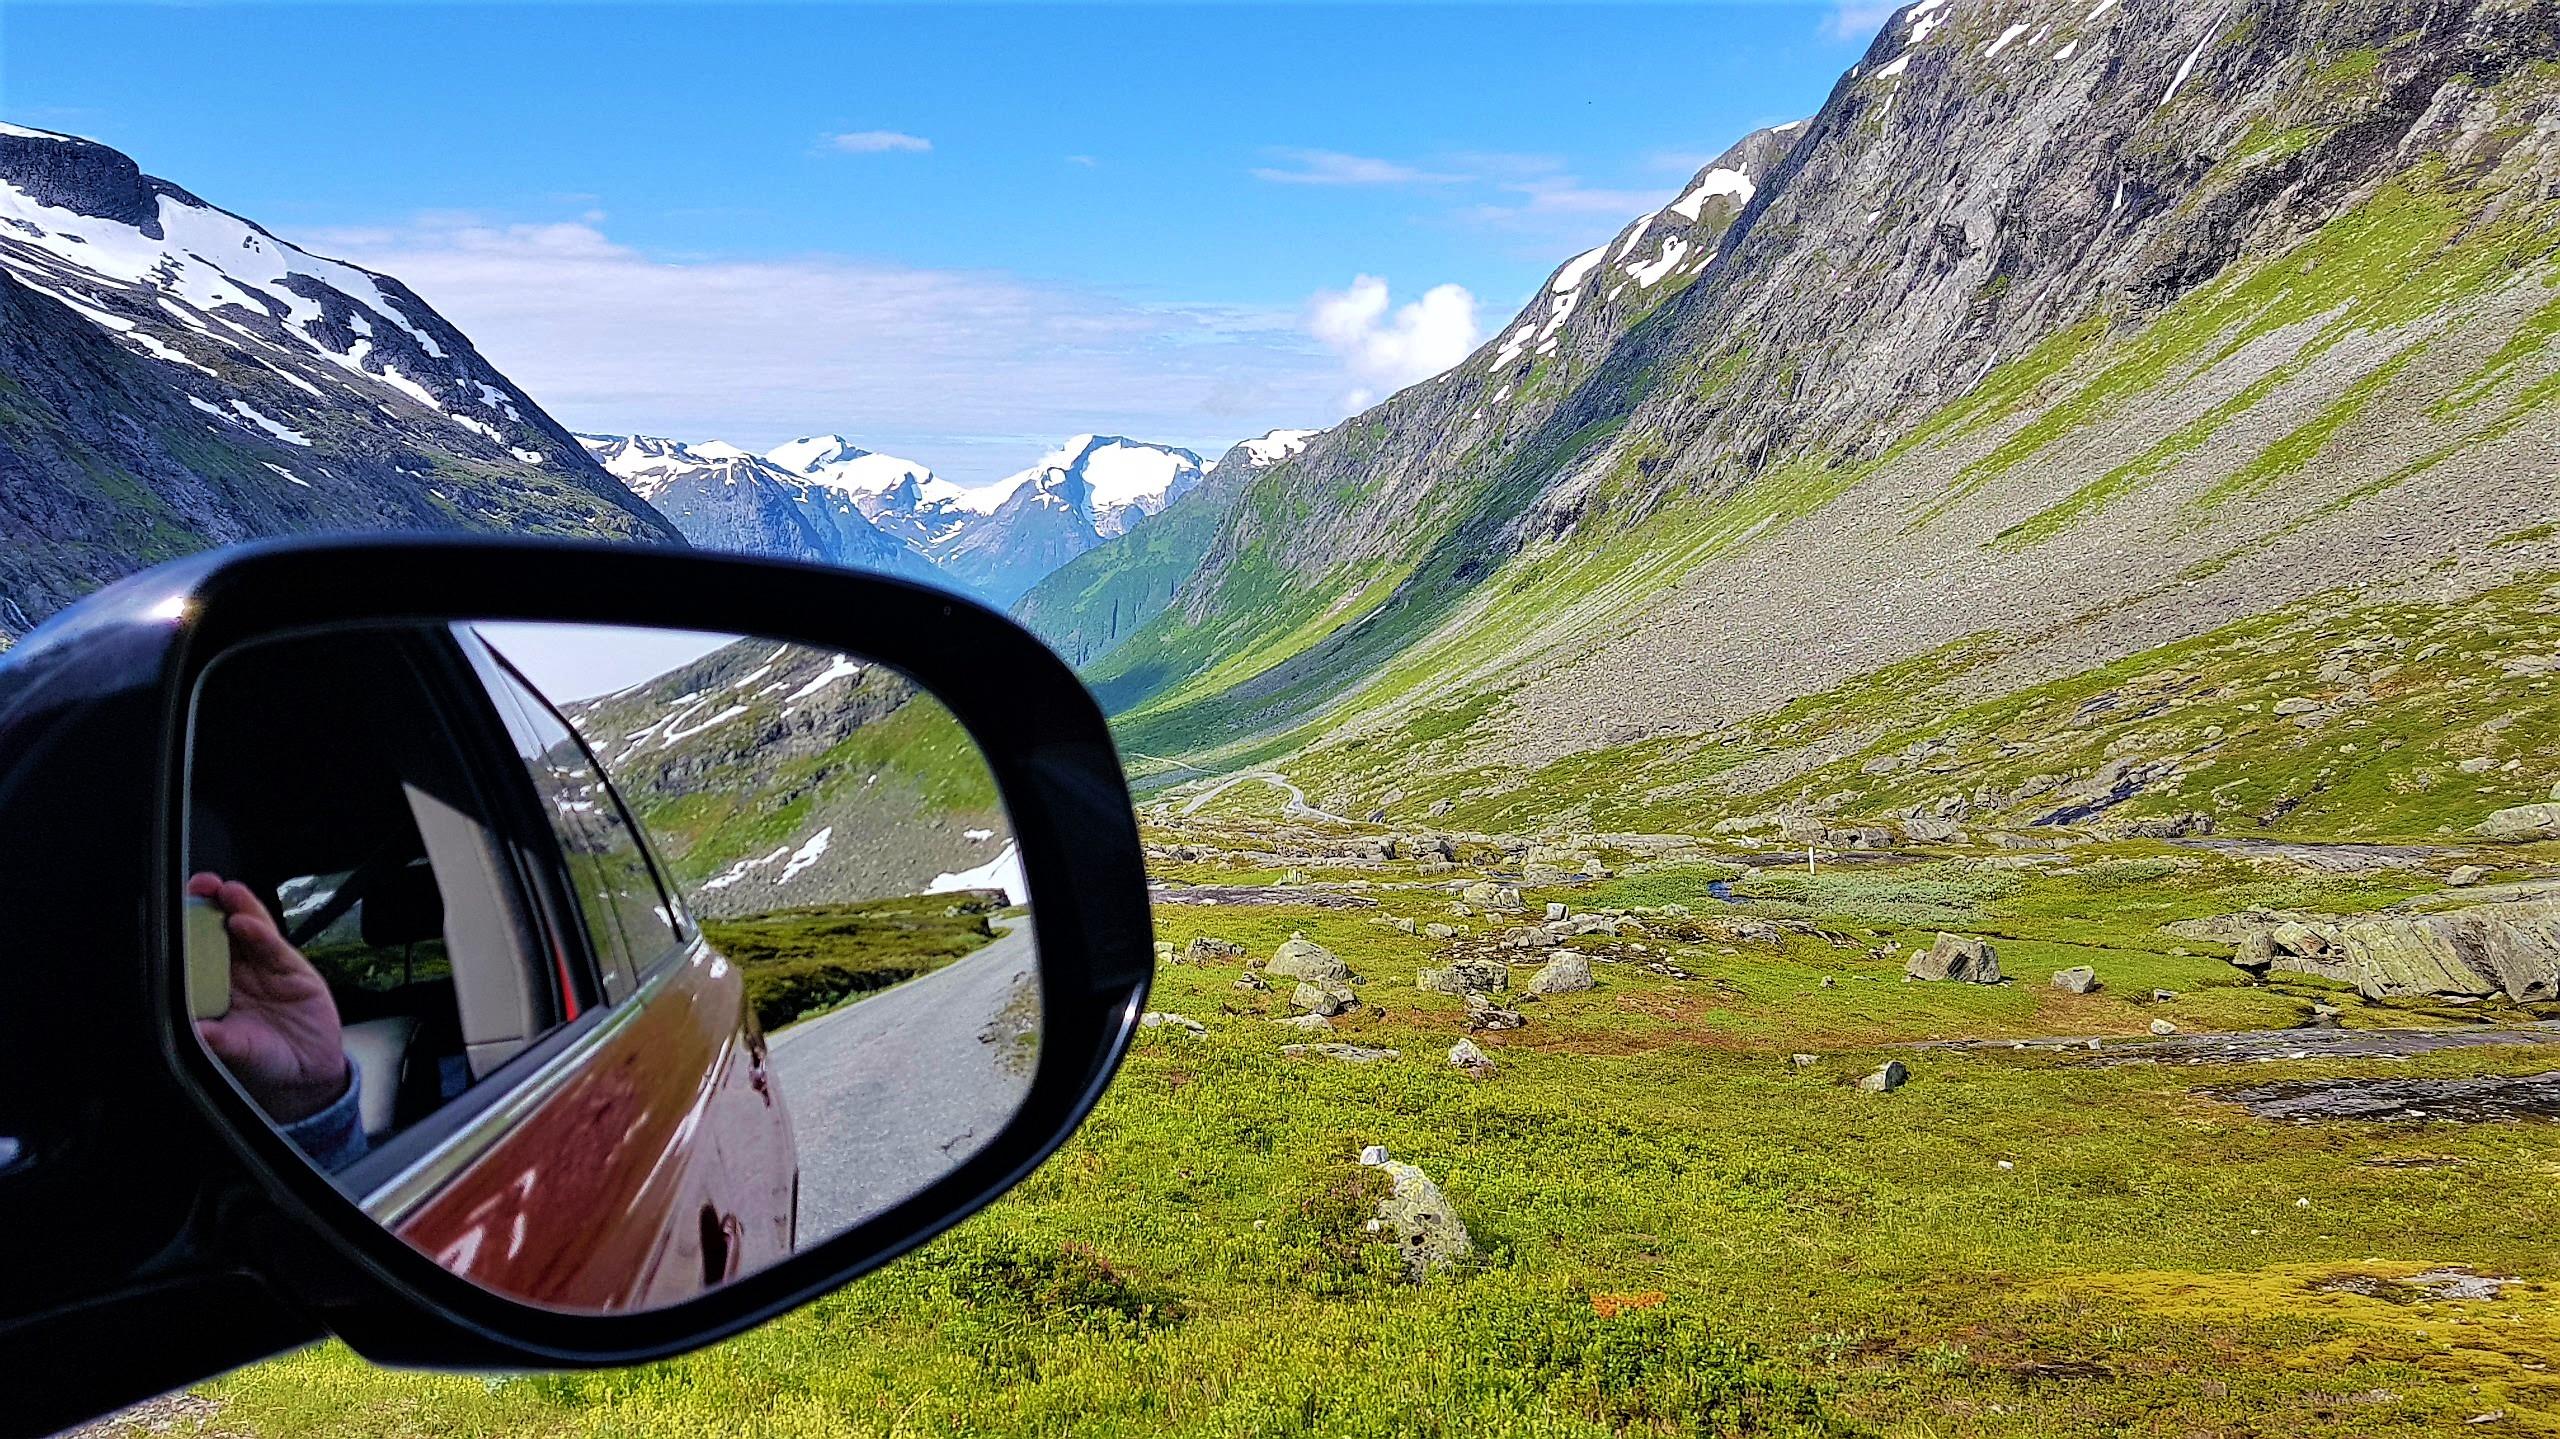 Bilferie i Norge - Gamle Strynefjellsveien - Reiseblogg